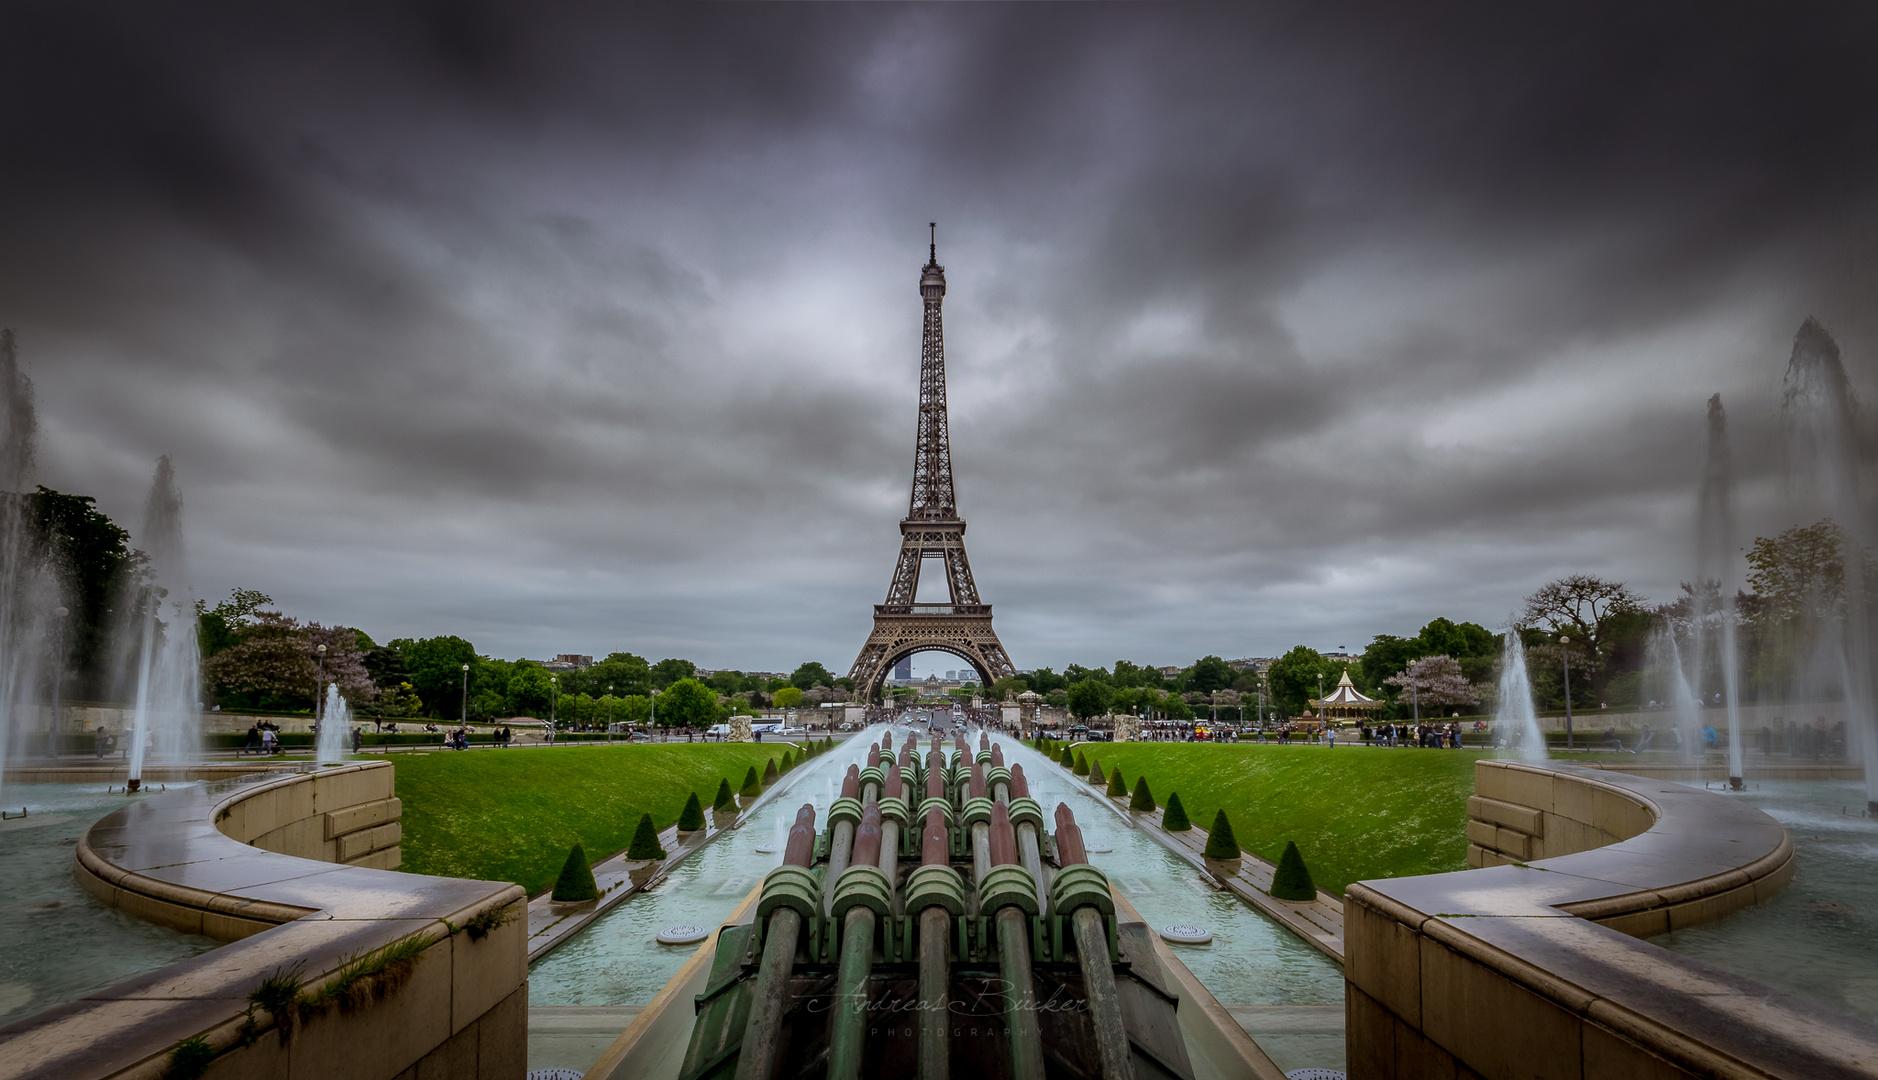 Tour Eiffel attack